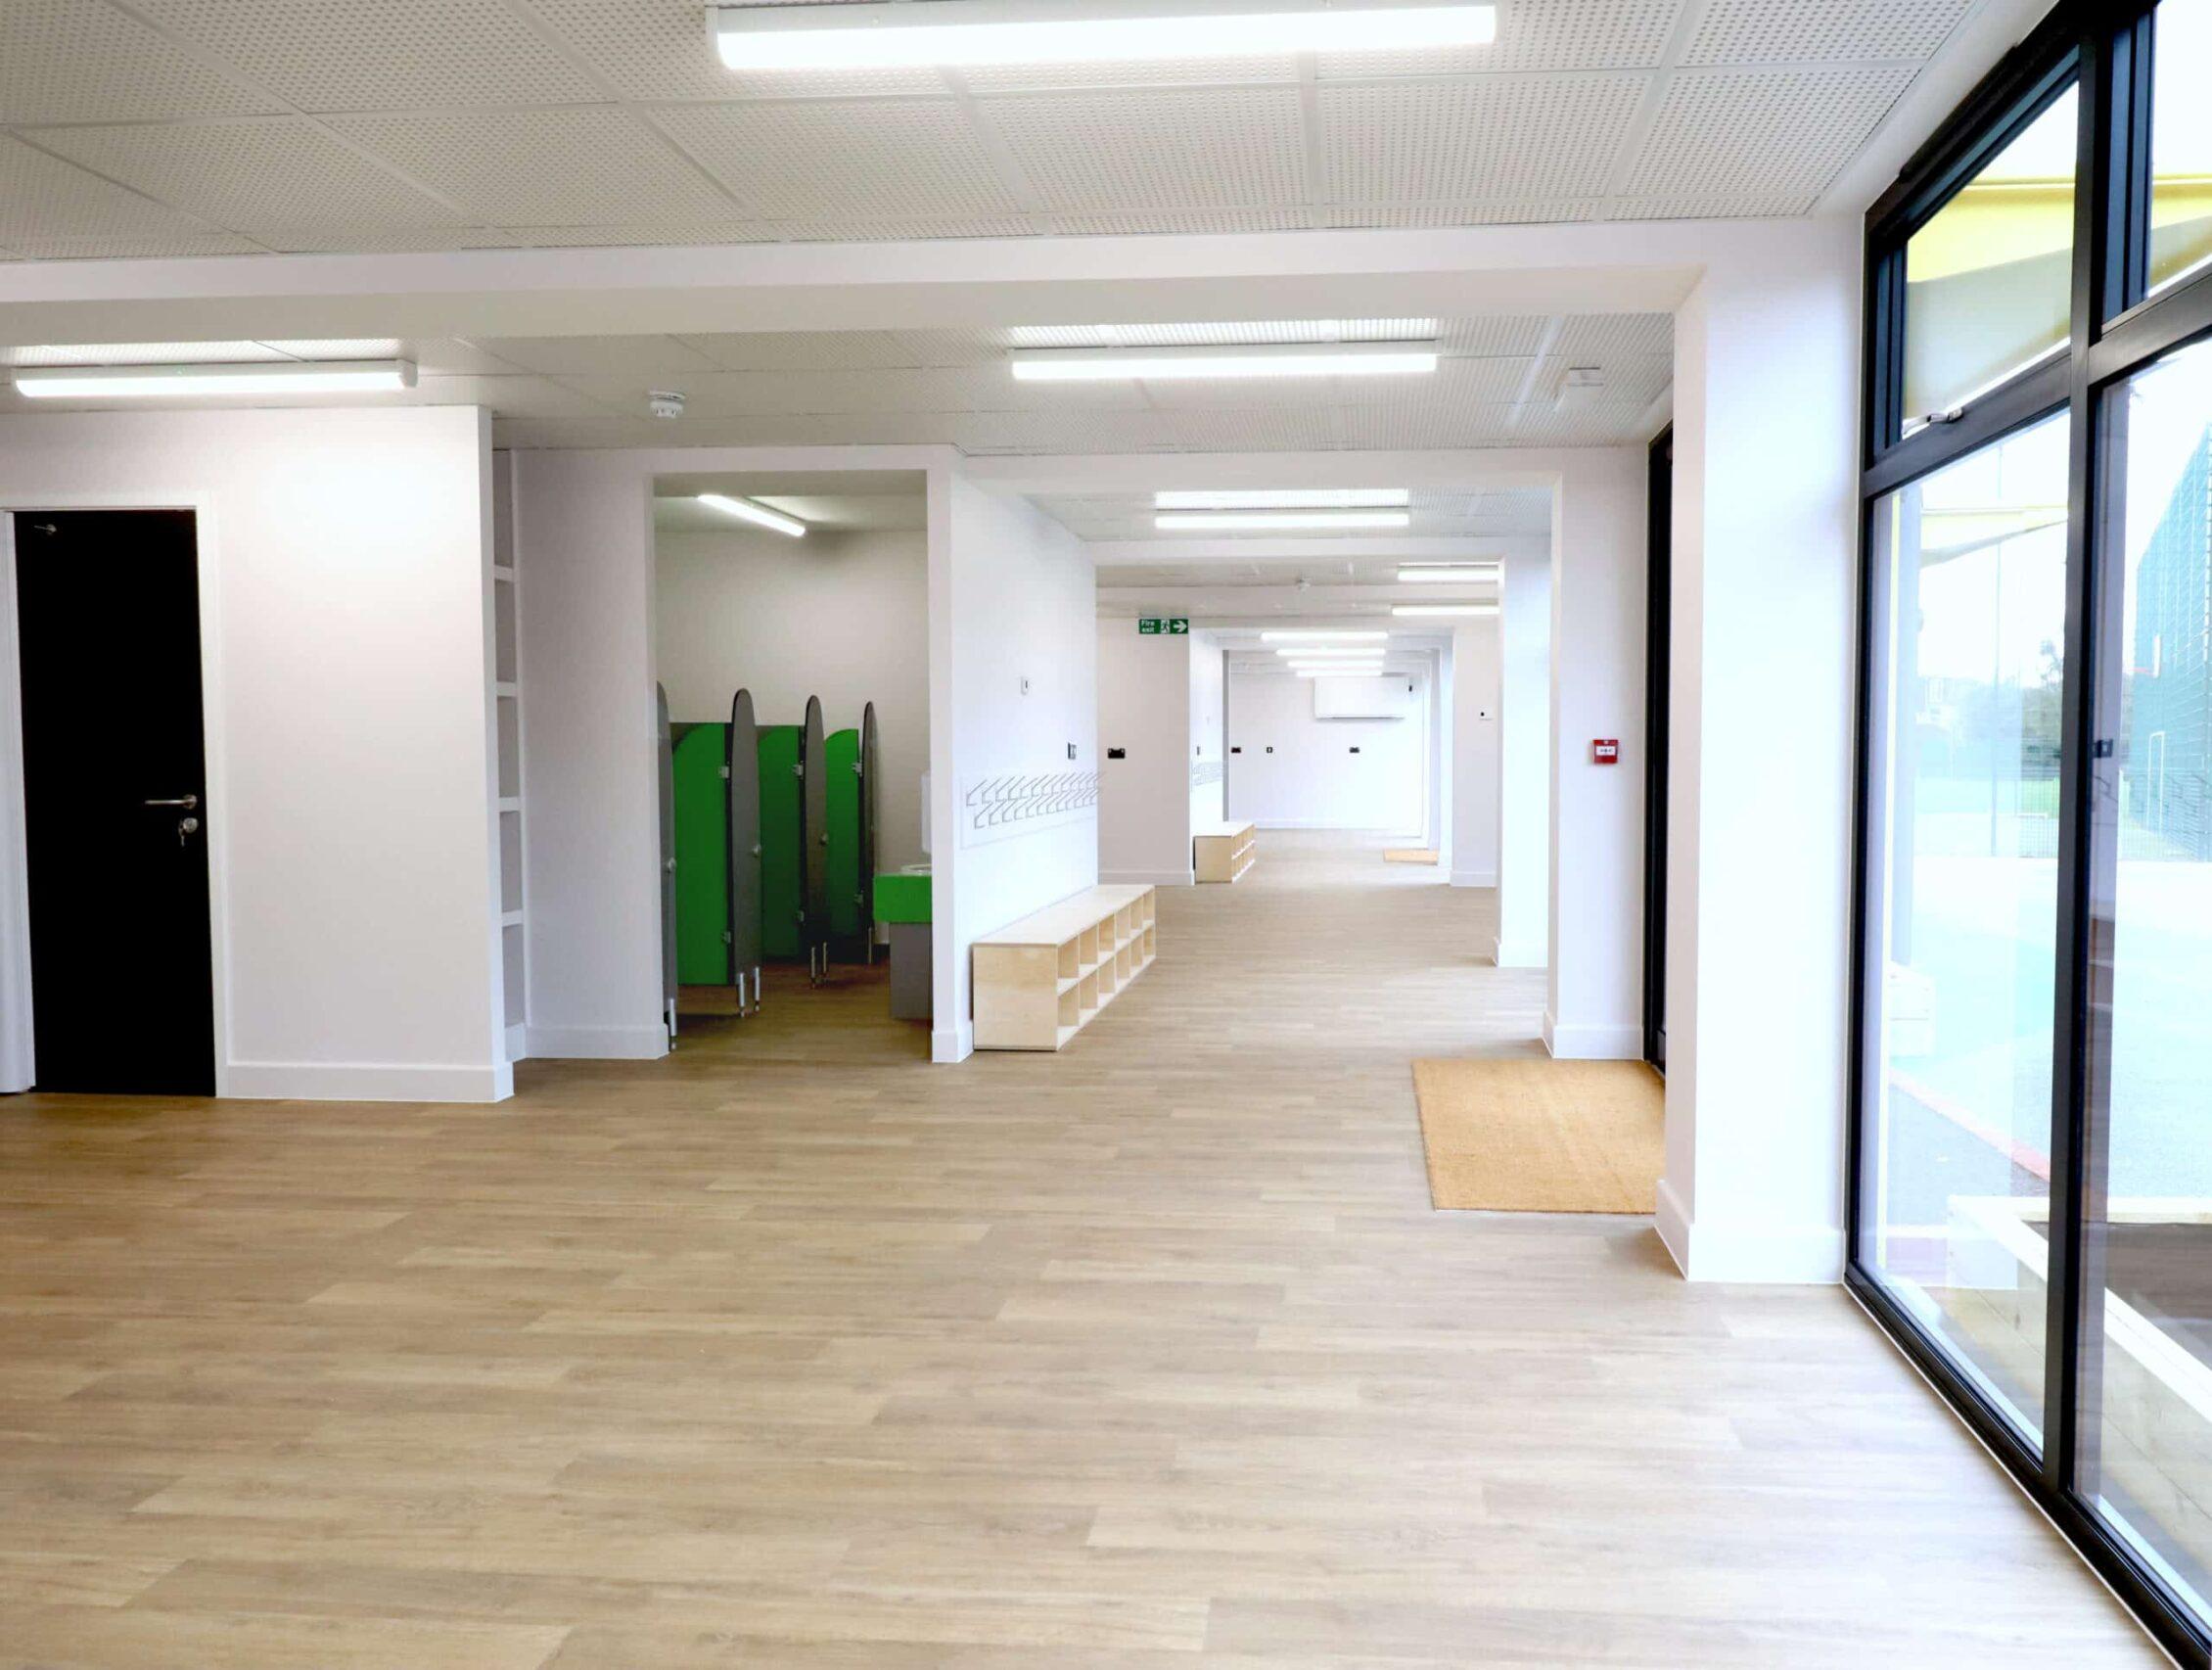 Interior view of modular education facility